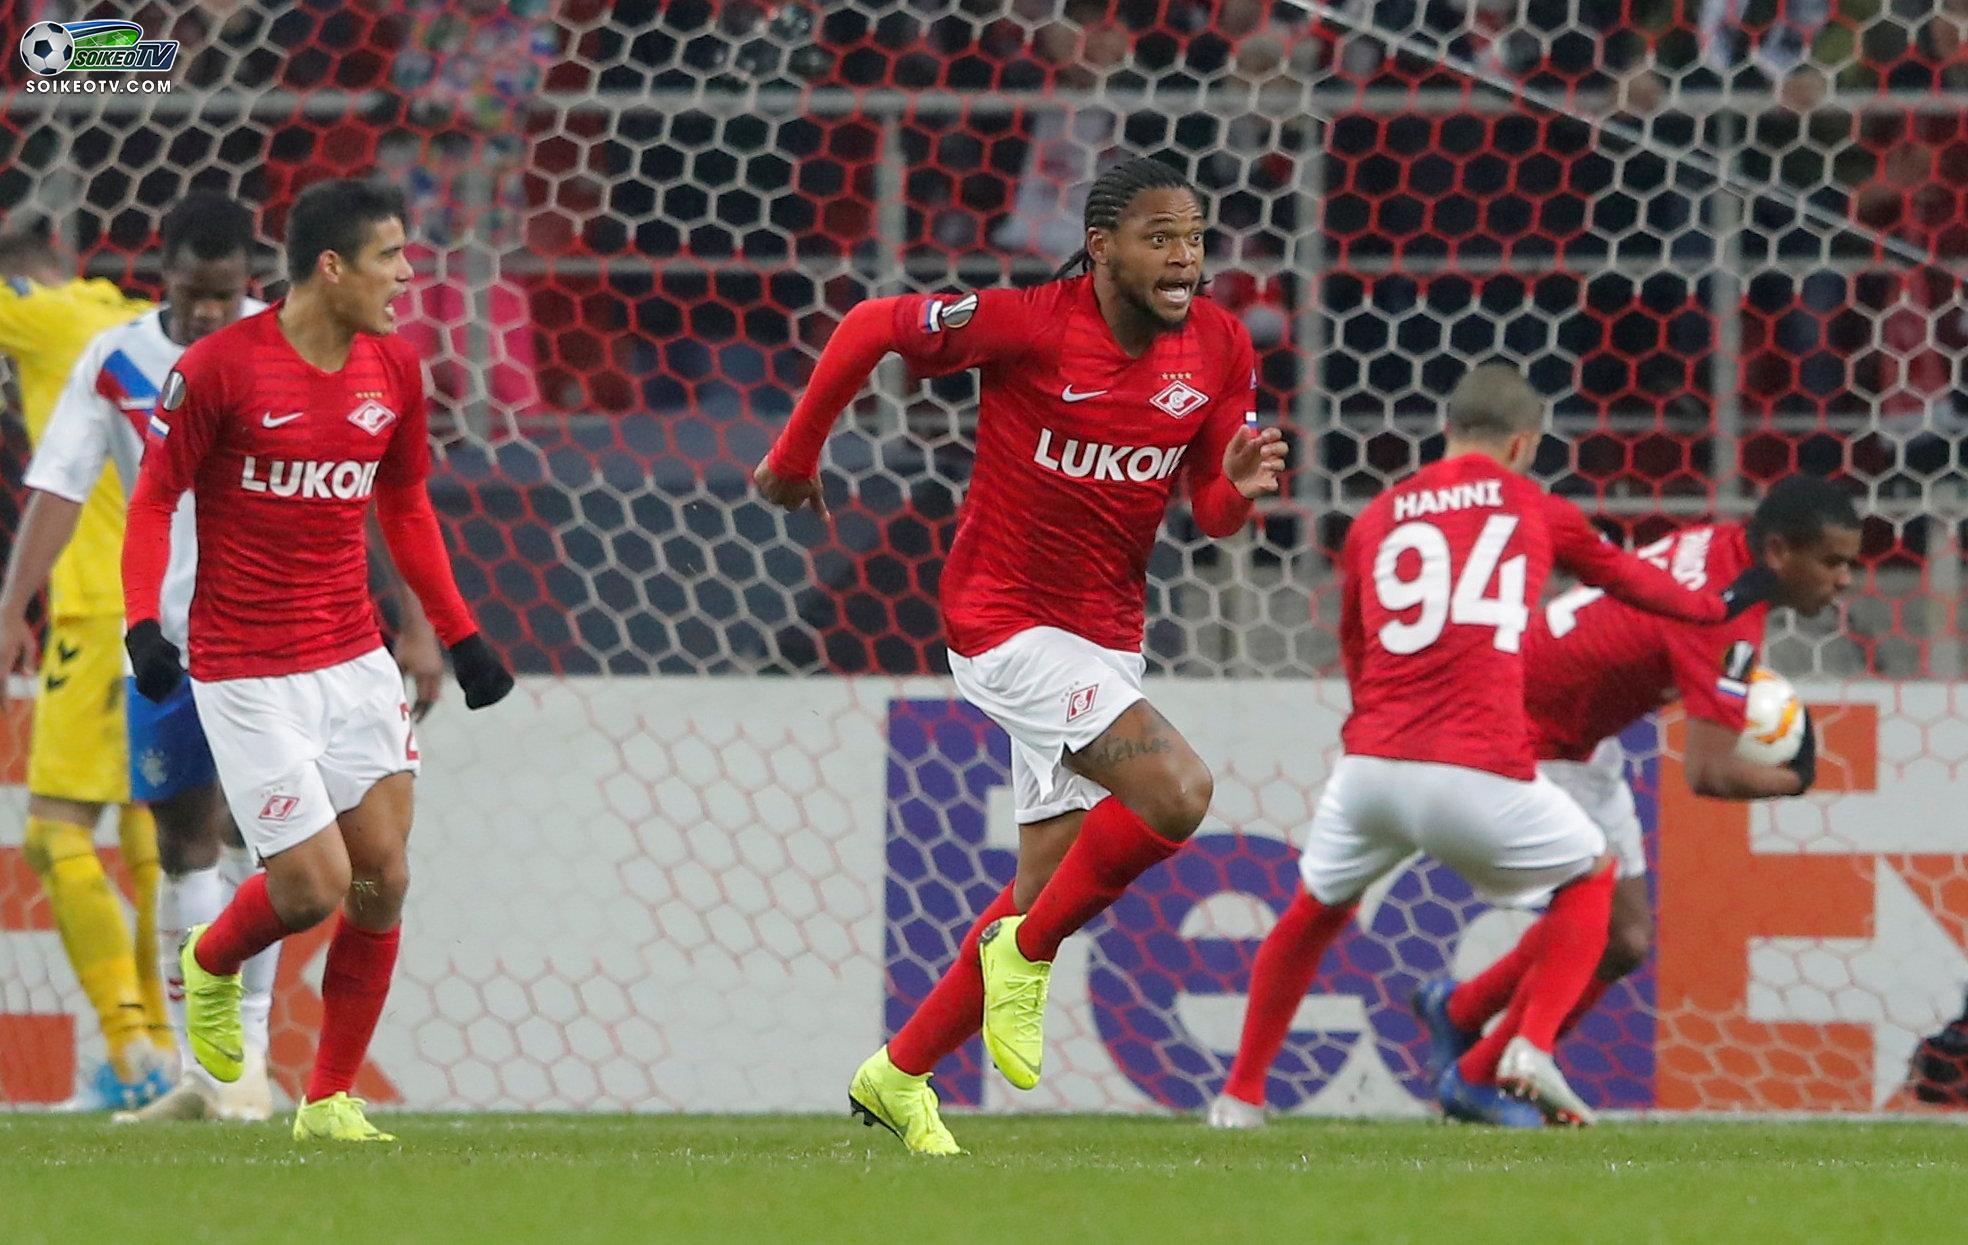 Spartak Moscow vs FC Thun